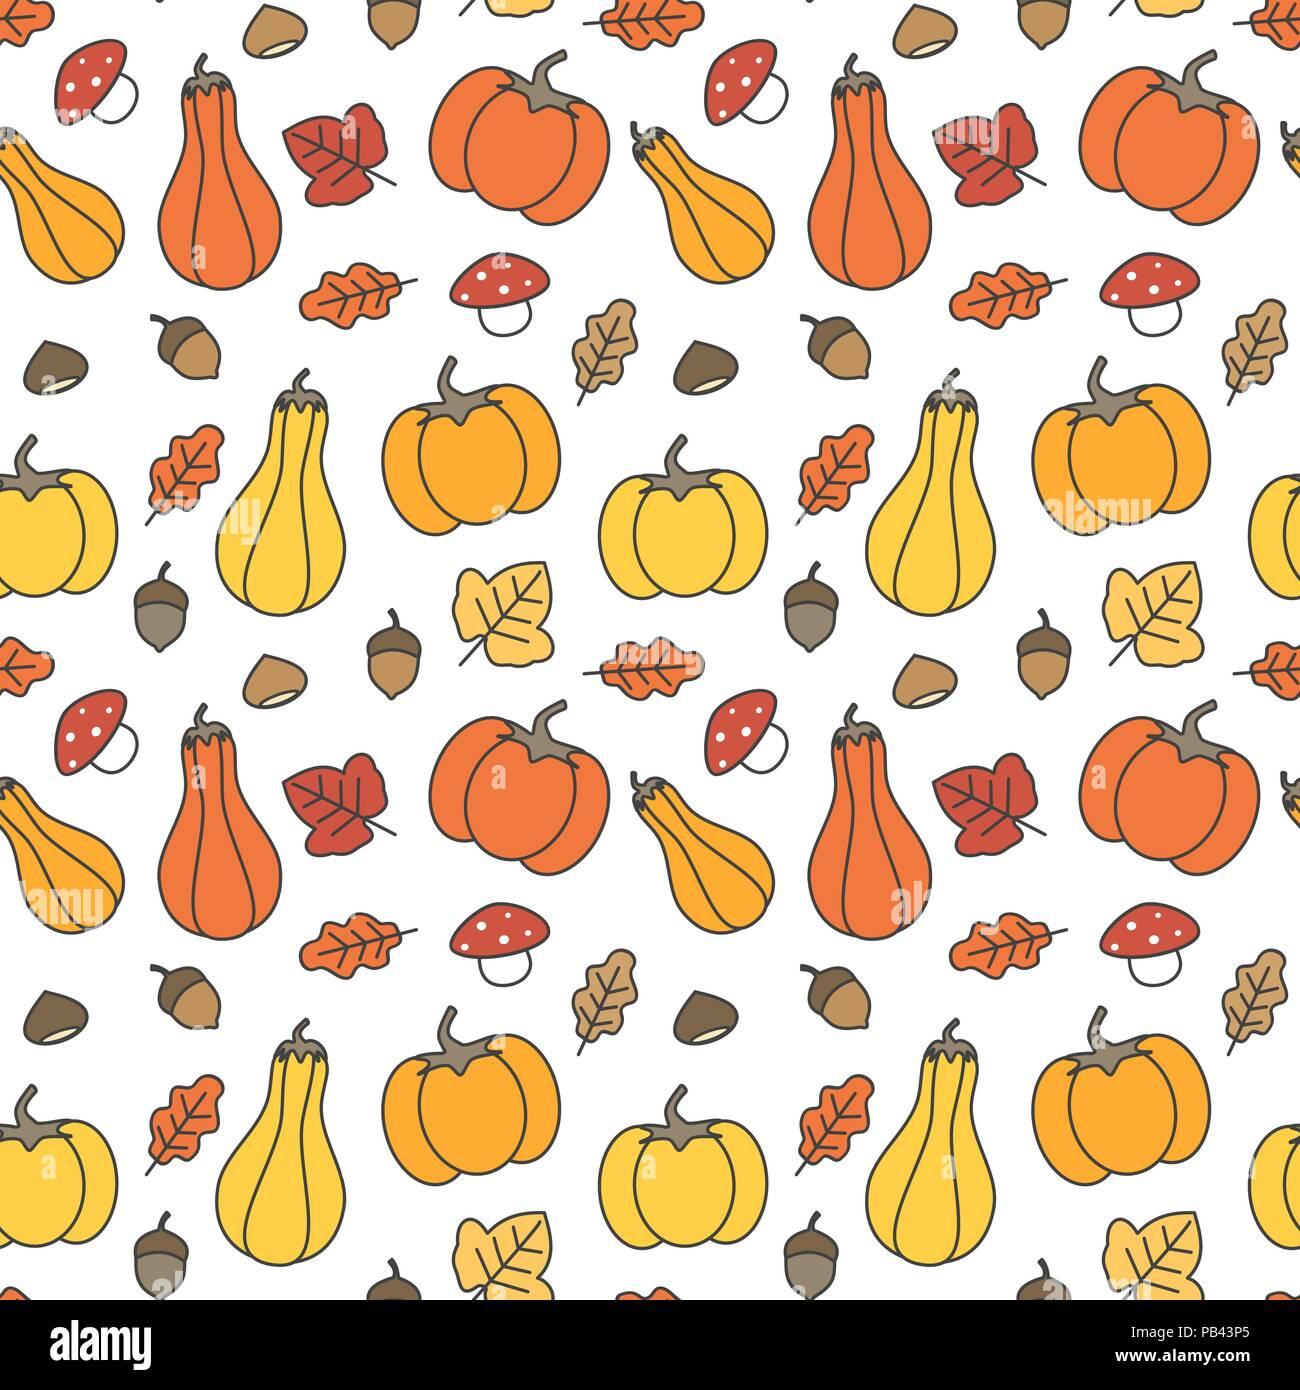 Cute Fall Autumn Seamless Vector Pattern Background